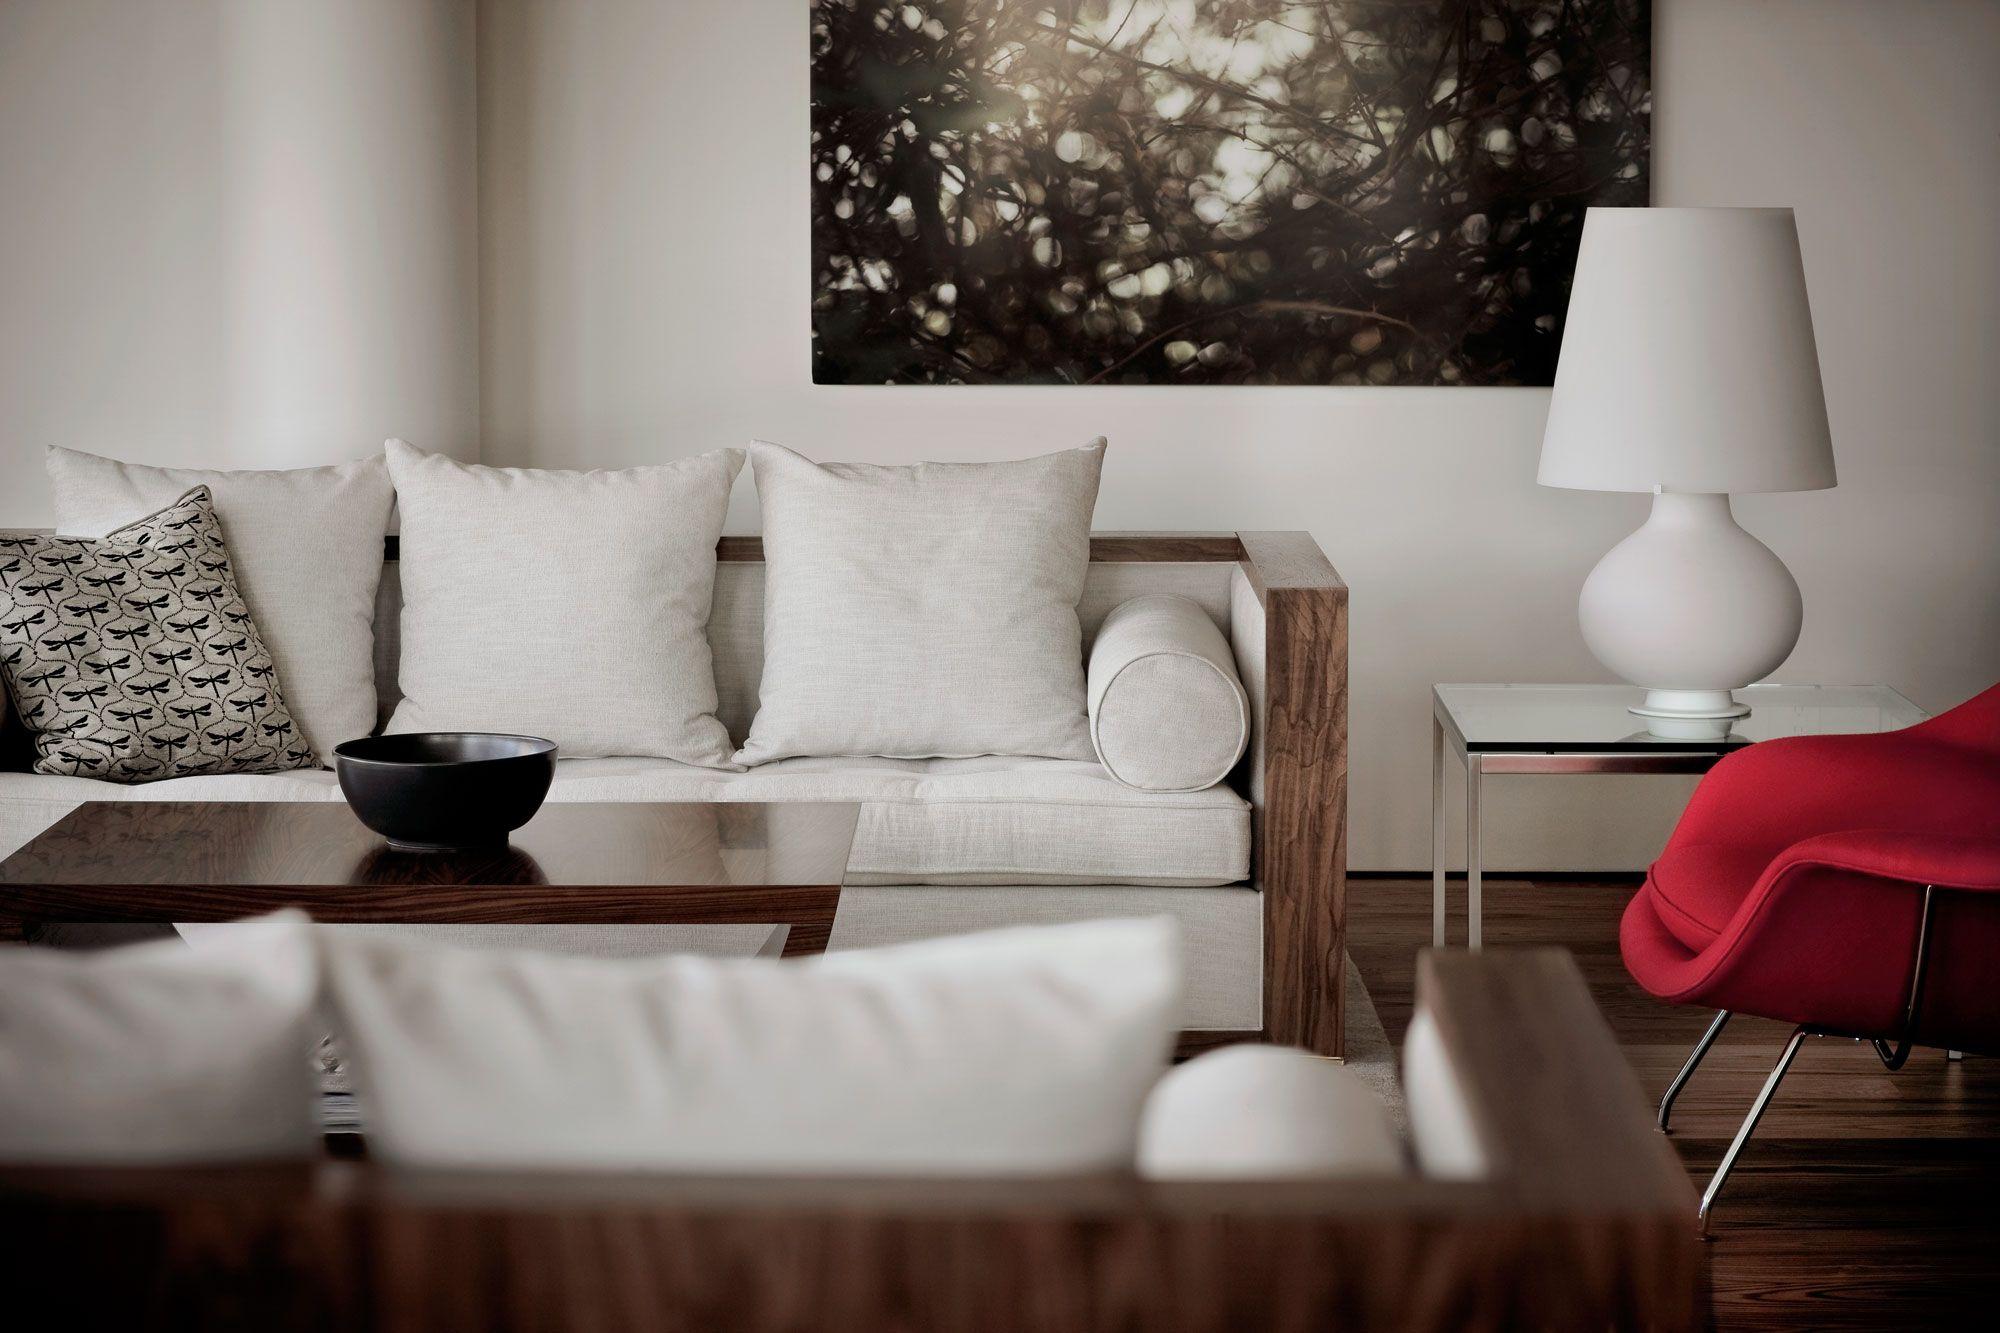 Luxury Penthouse In Downtown Montreal By Rene Desjardins Interiors - Downtown-montreal-penthouse-by-rene-desjardins